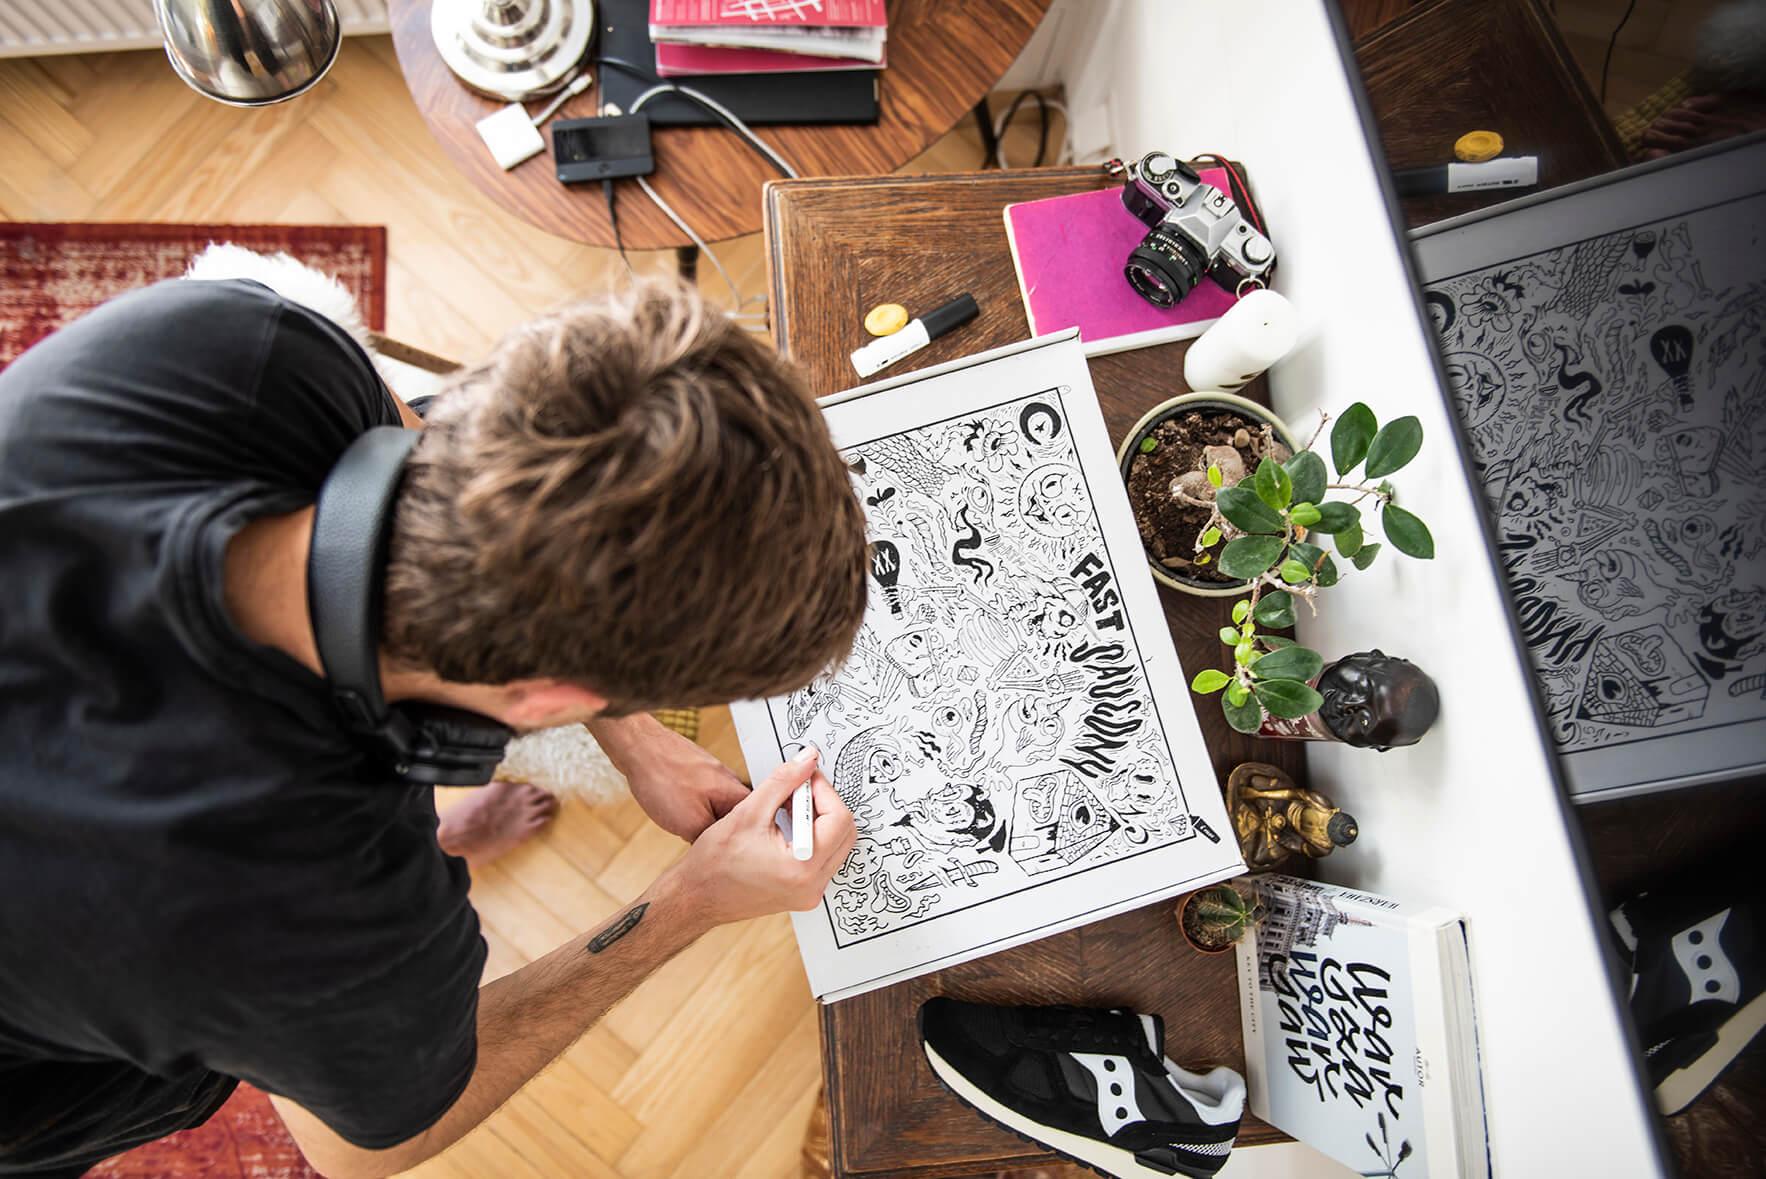 un chico dibuja sobre una caja postal blanca